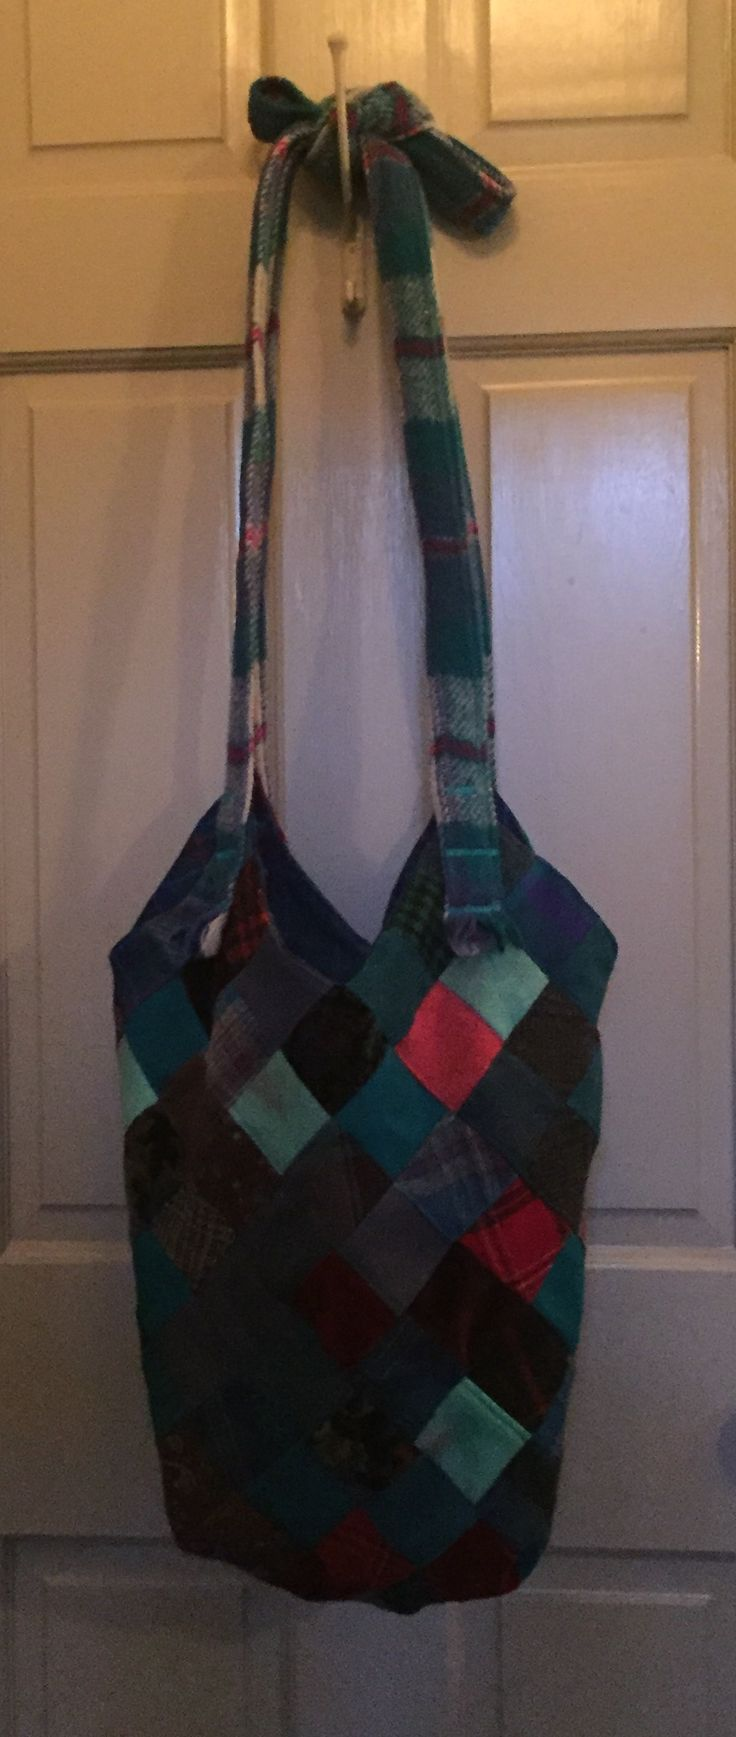 Wool patchwork bag